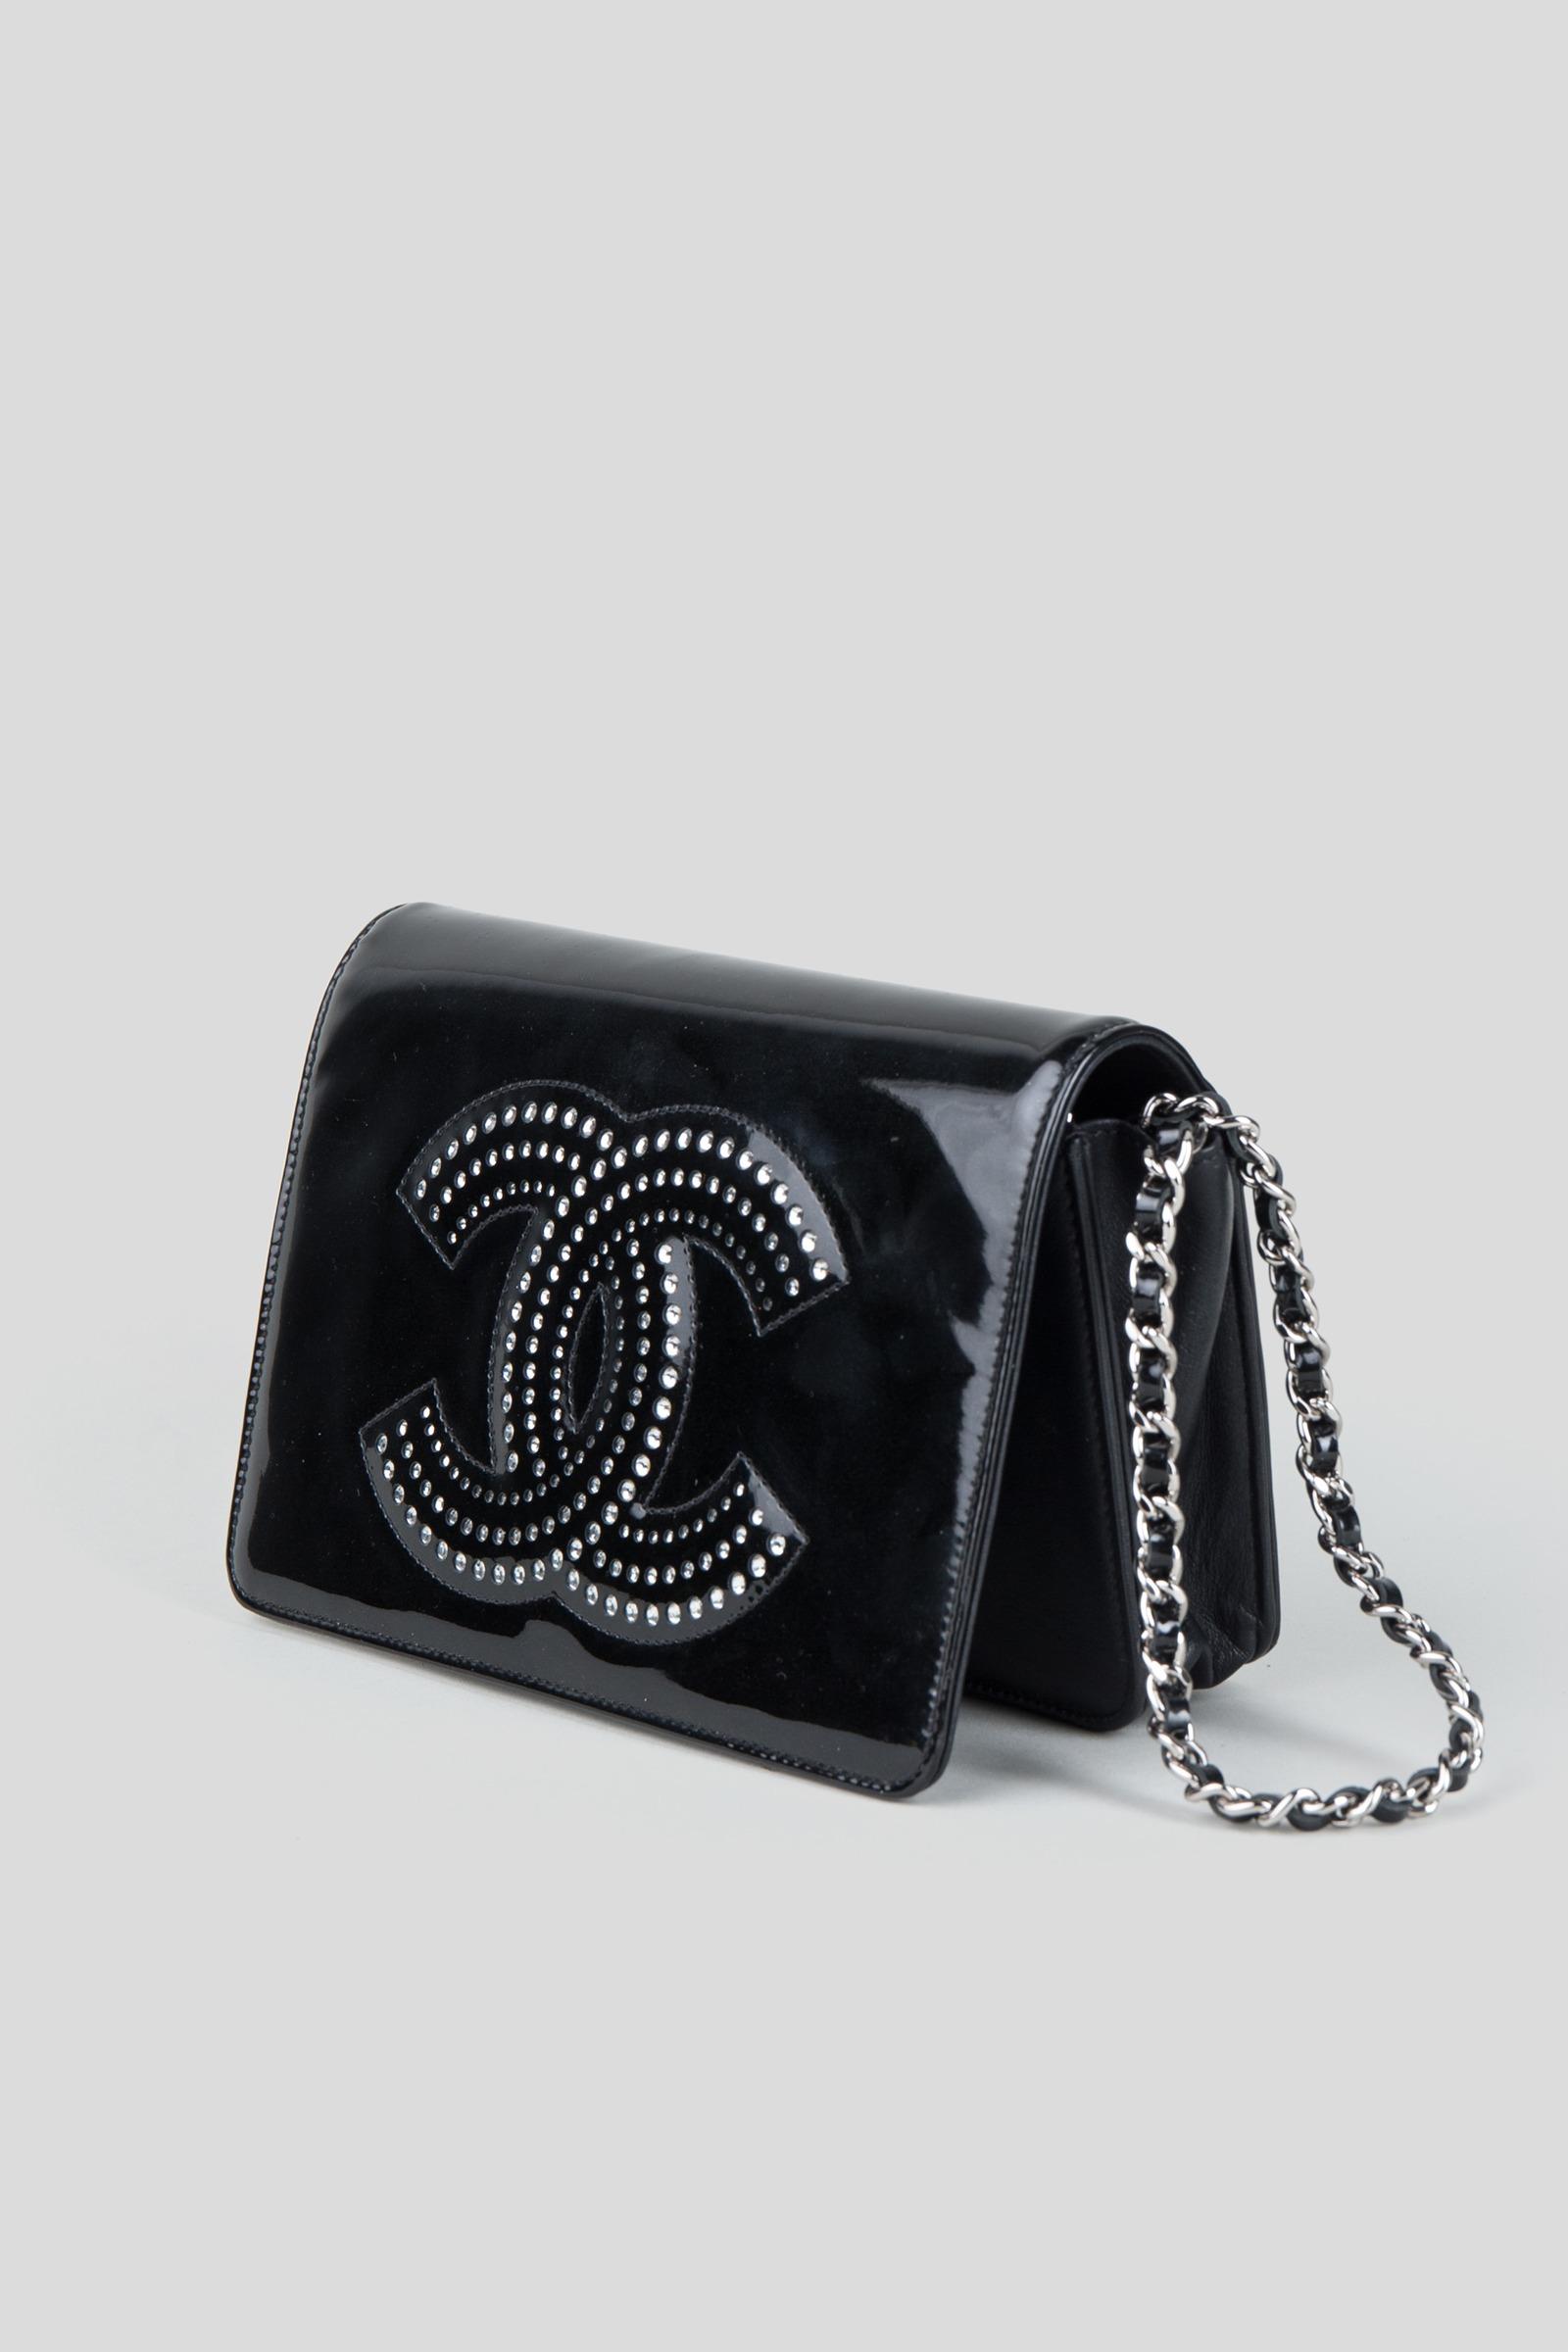 f2d8b83b14f705 Rent CHANEL Patent Leather Embellished Clutch in Dubai - Designer 24